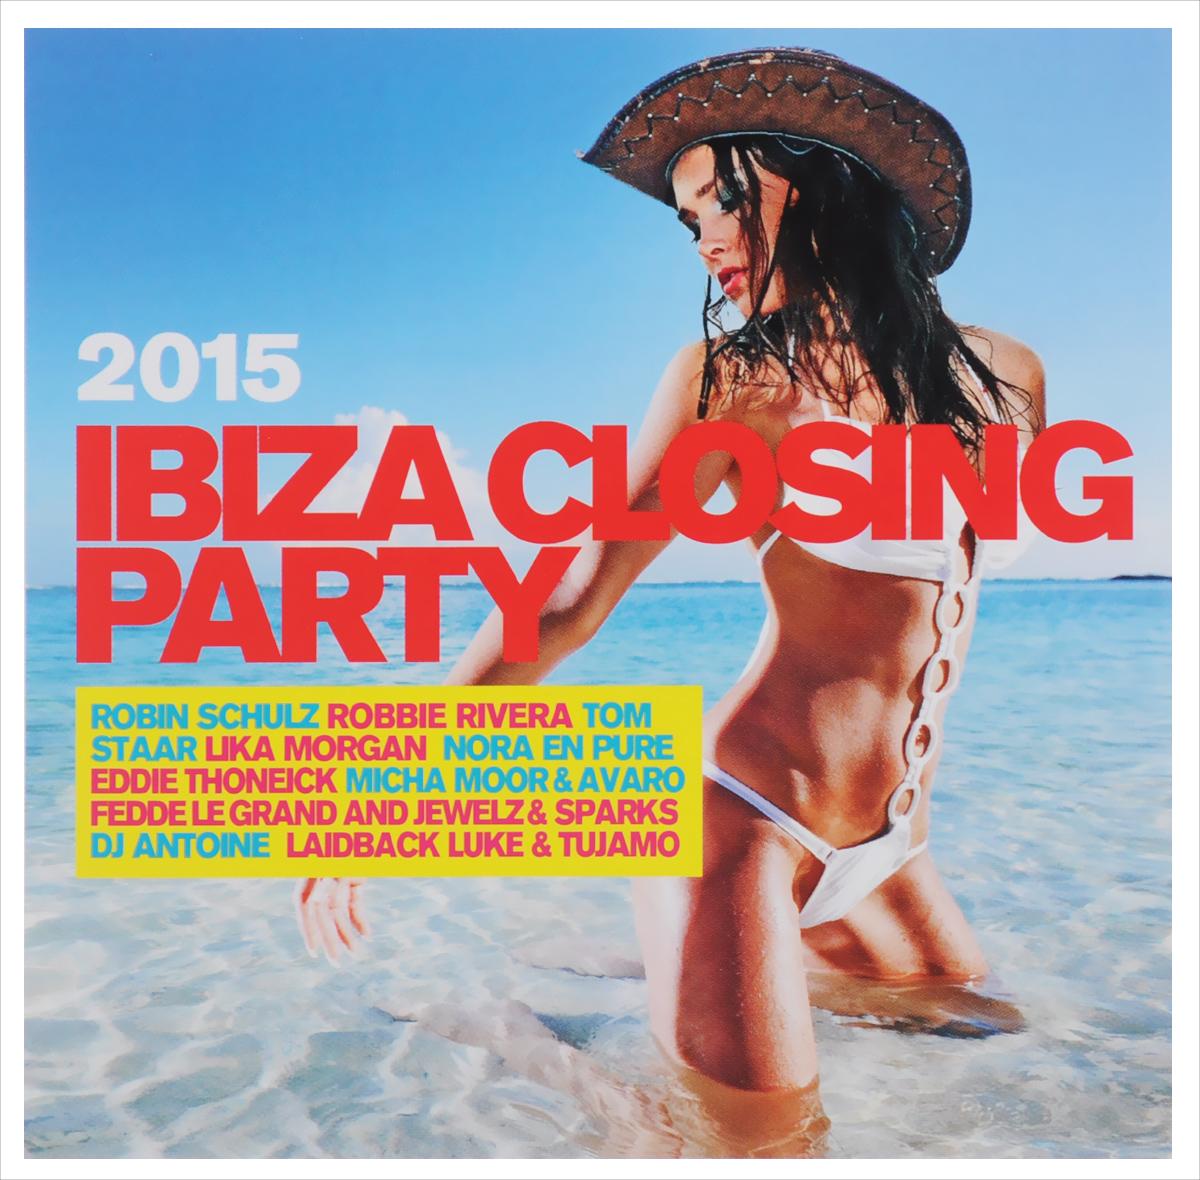 "Стив Анджелло,Robin S.,Laidback Luke,Tujamo,""Sick Individuals"",Арно Кост,Томас Голд,Робби Ривьера,Федд Ле Гранд,Ники Ромеро,Ilsey,Робин Шульц,""The Disco Boys"",Nora En Pure,DJ Antoine,Storm,Нильс Ван Гог,""The Hoxton Whores"",Kid Massive,Ned Shepard & Soul Tan Ibiza Closing Party 2015 (2 CD)"